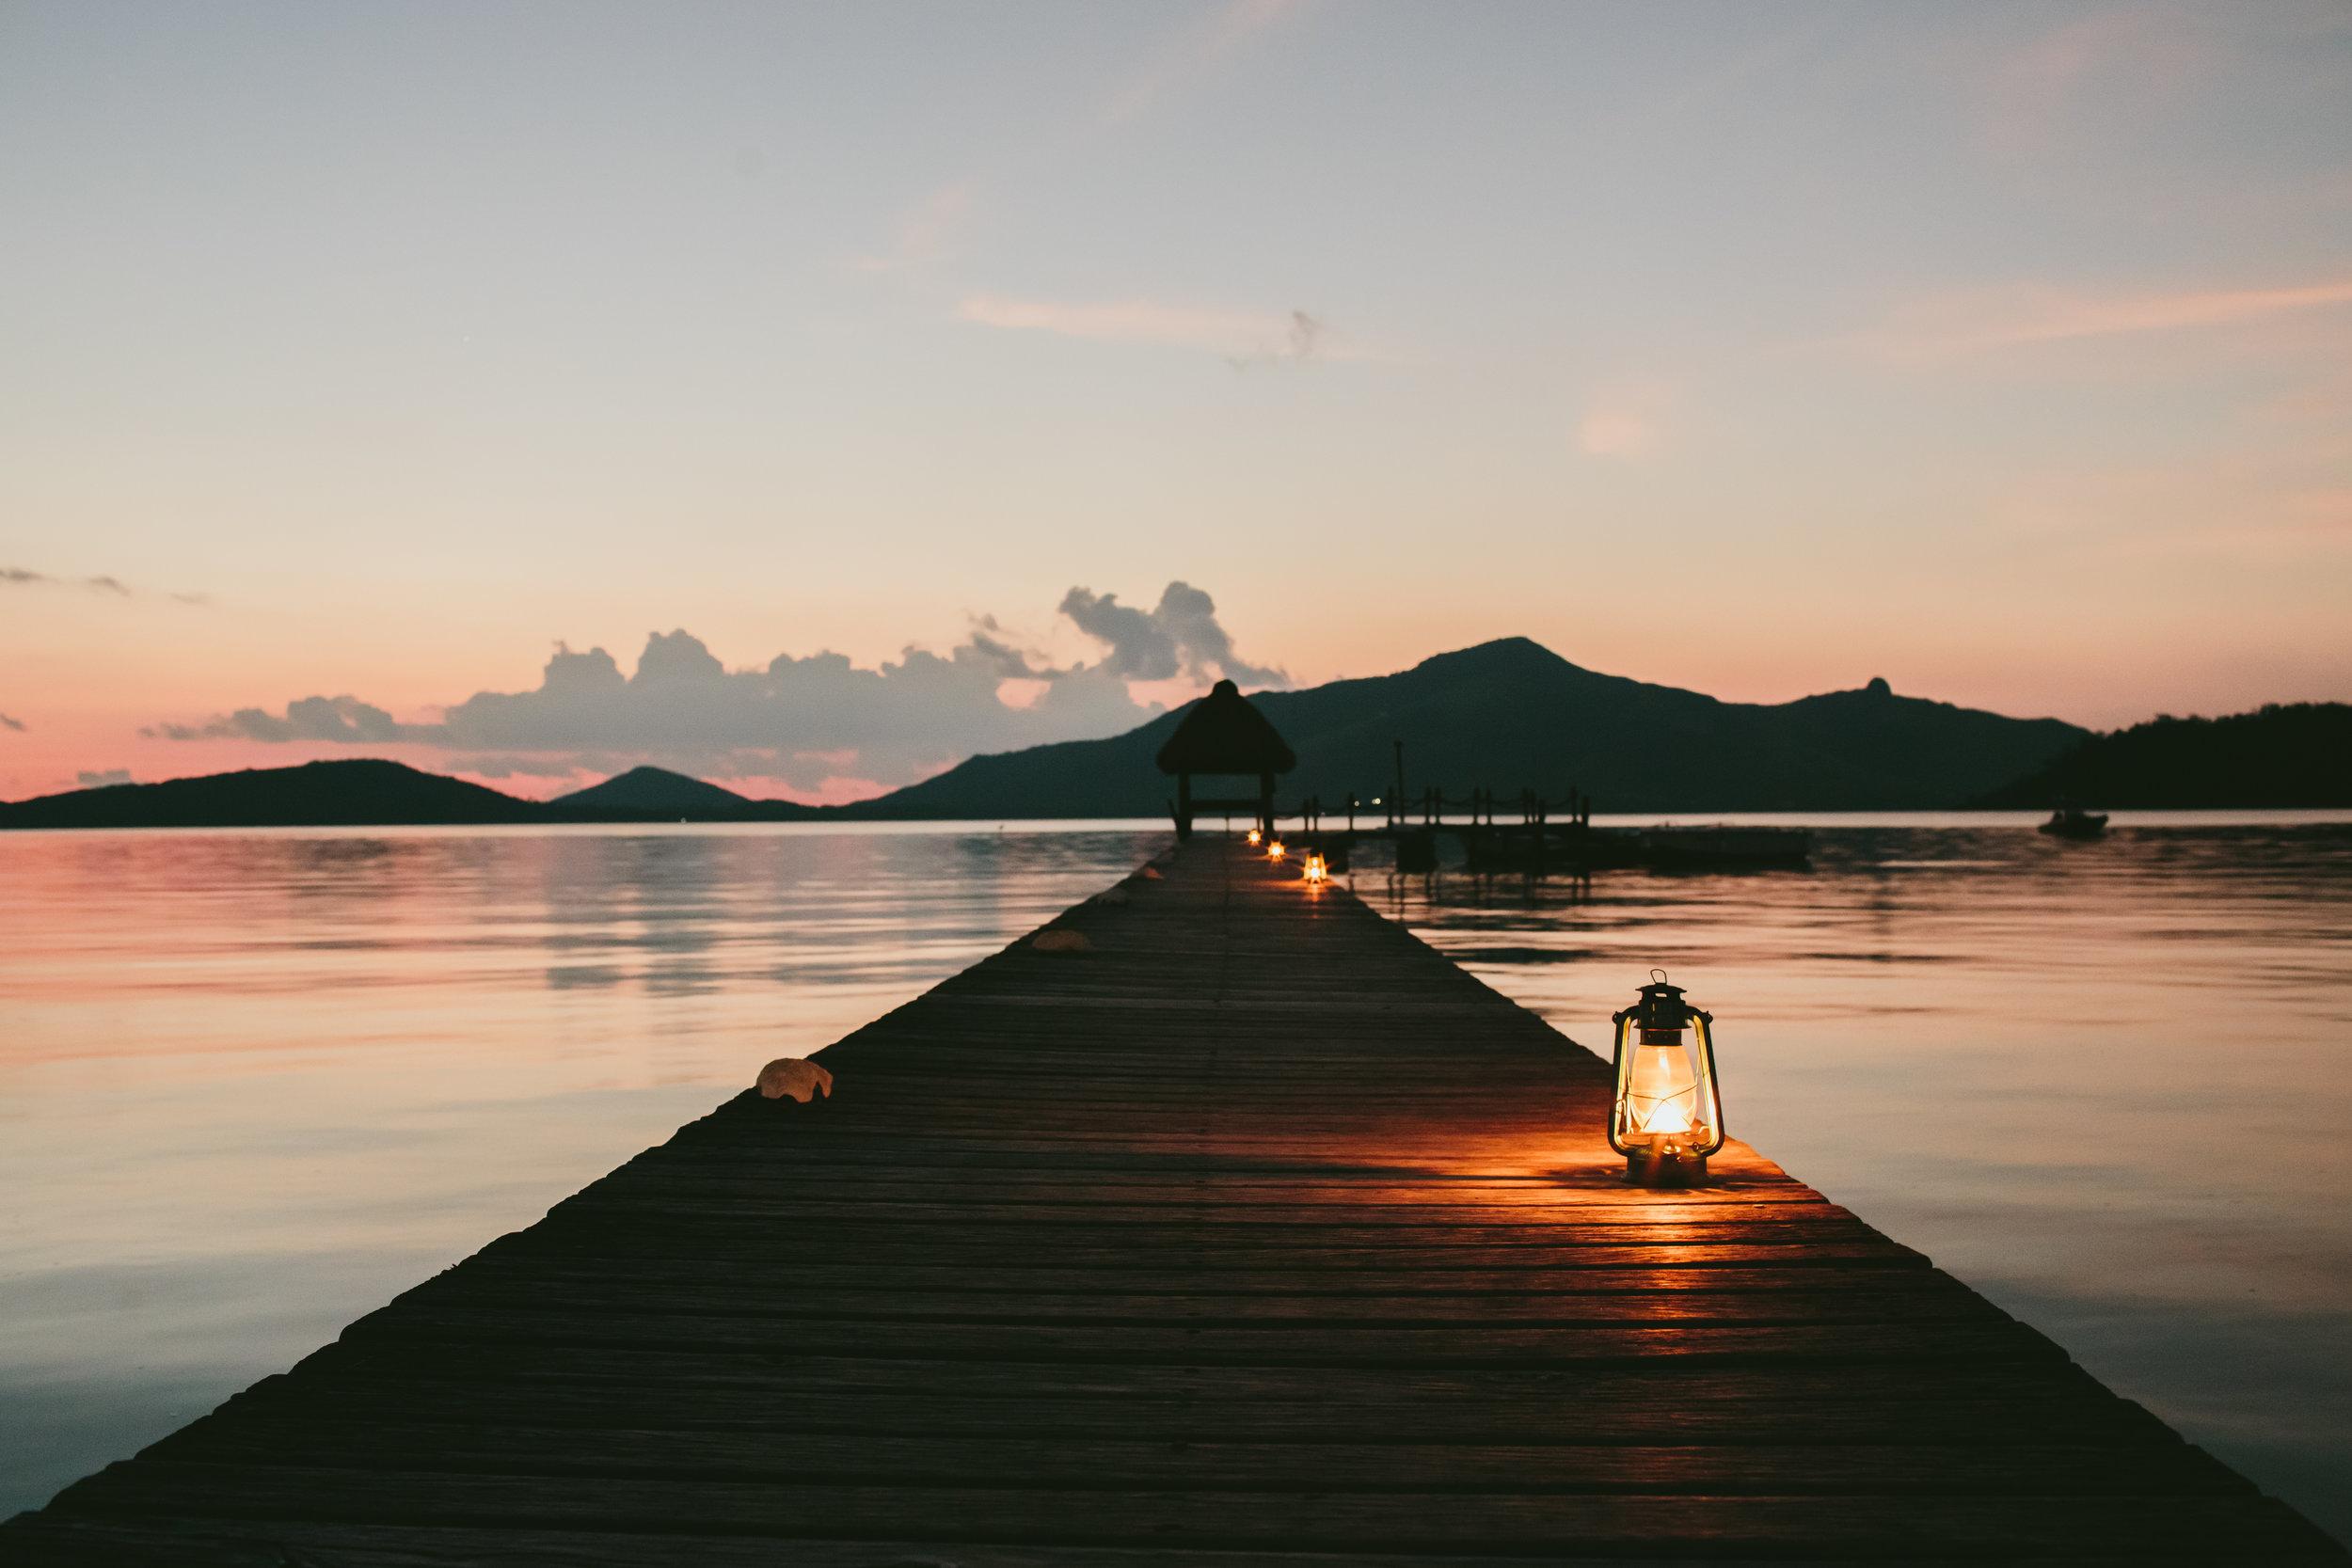 TurtleIsland-dock sunset-KamaCatchMePhotography-TurtleIsland-72.jpg